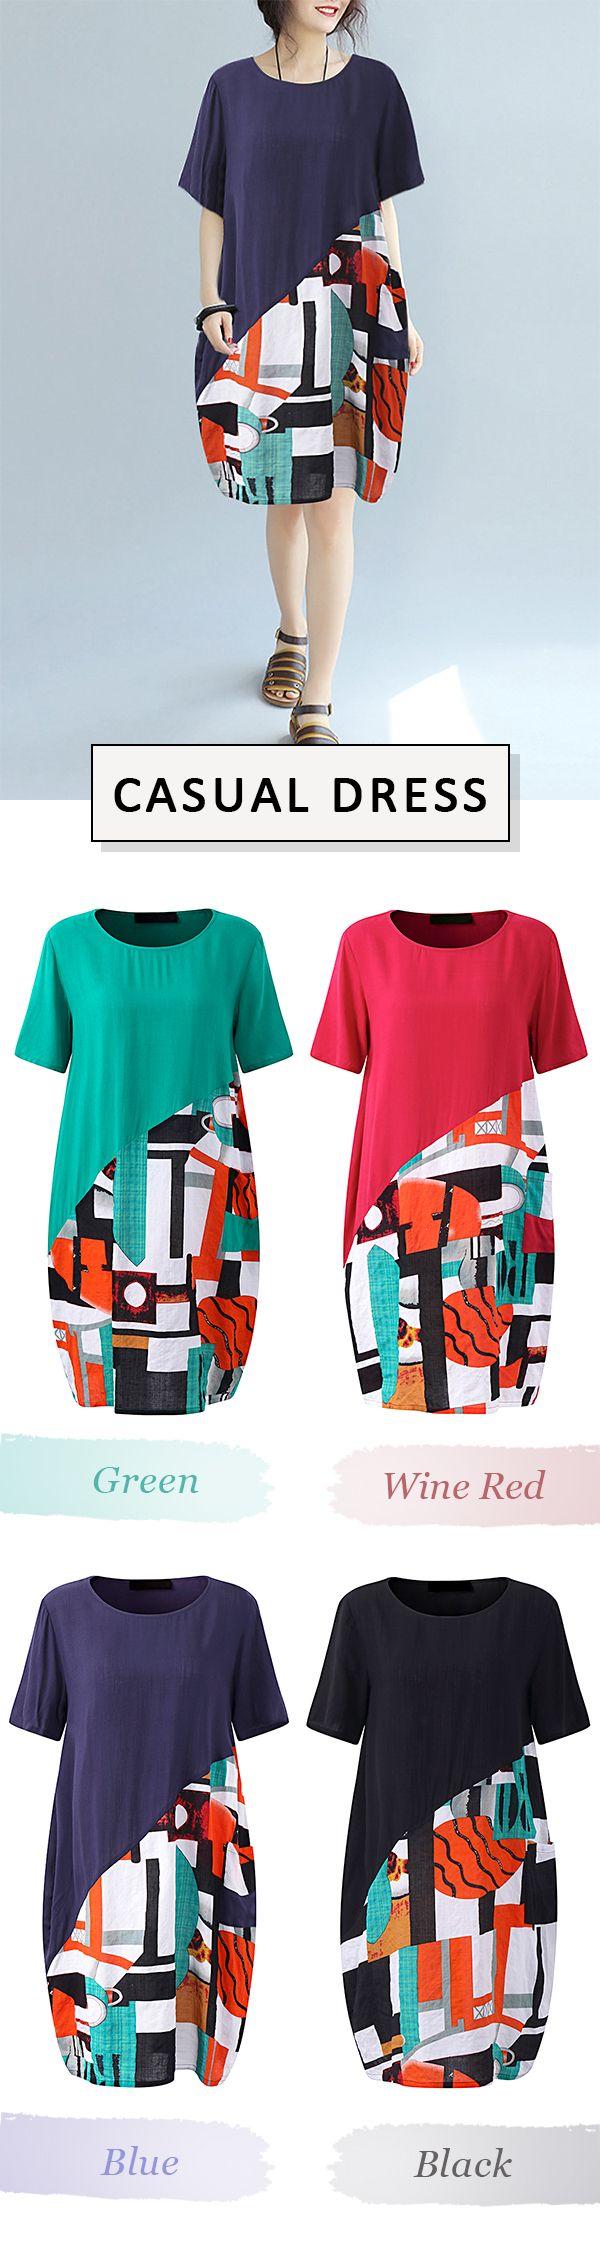 US$ 22.48 Gracila Casual Print Patchwork Short Sleeve O-neck Loose Dress For Women